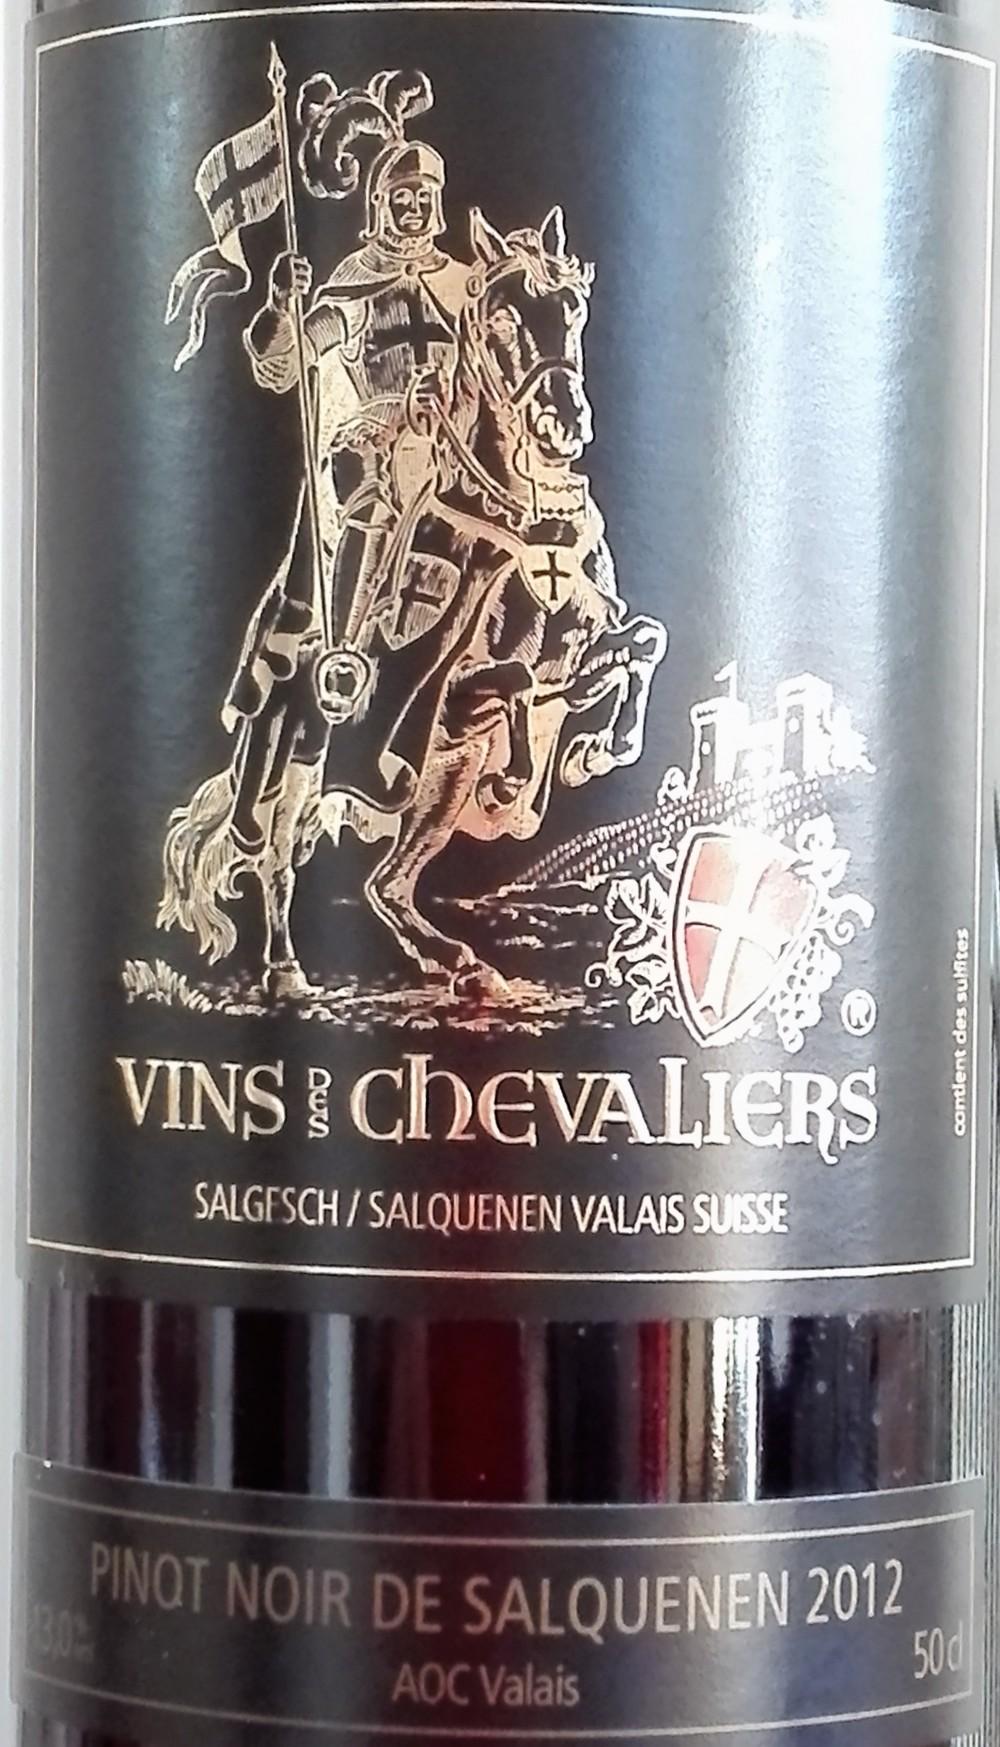 Pinot Noir del Salquenen 2012